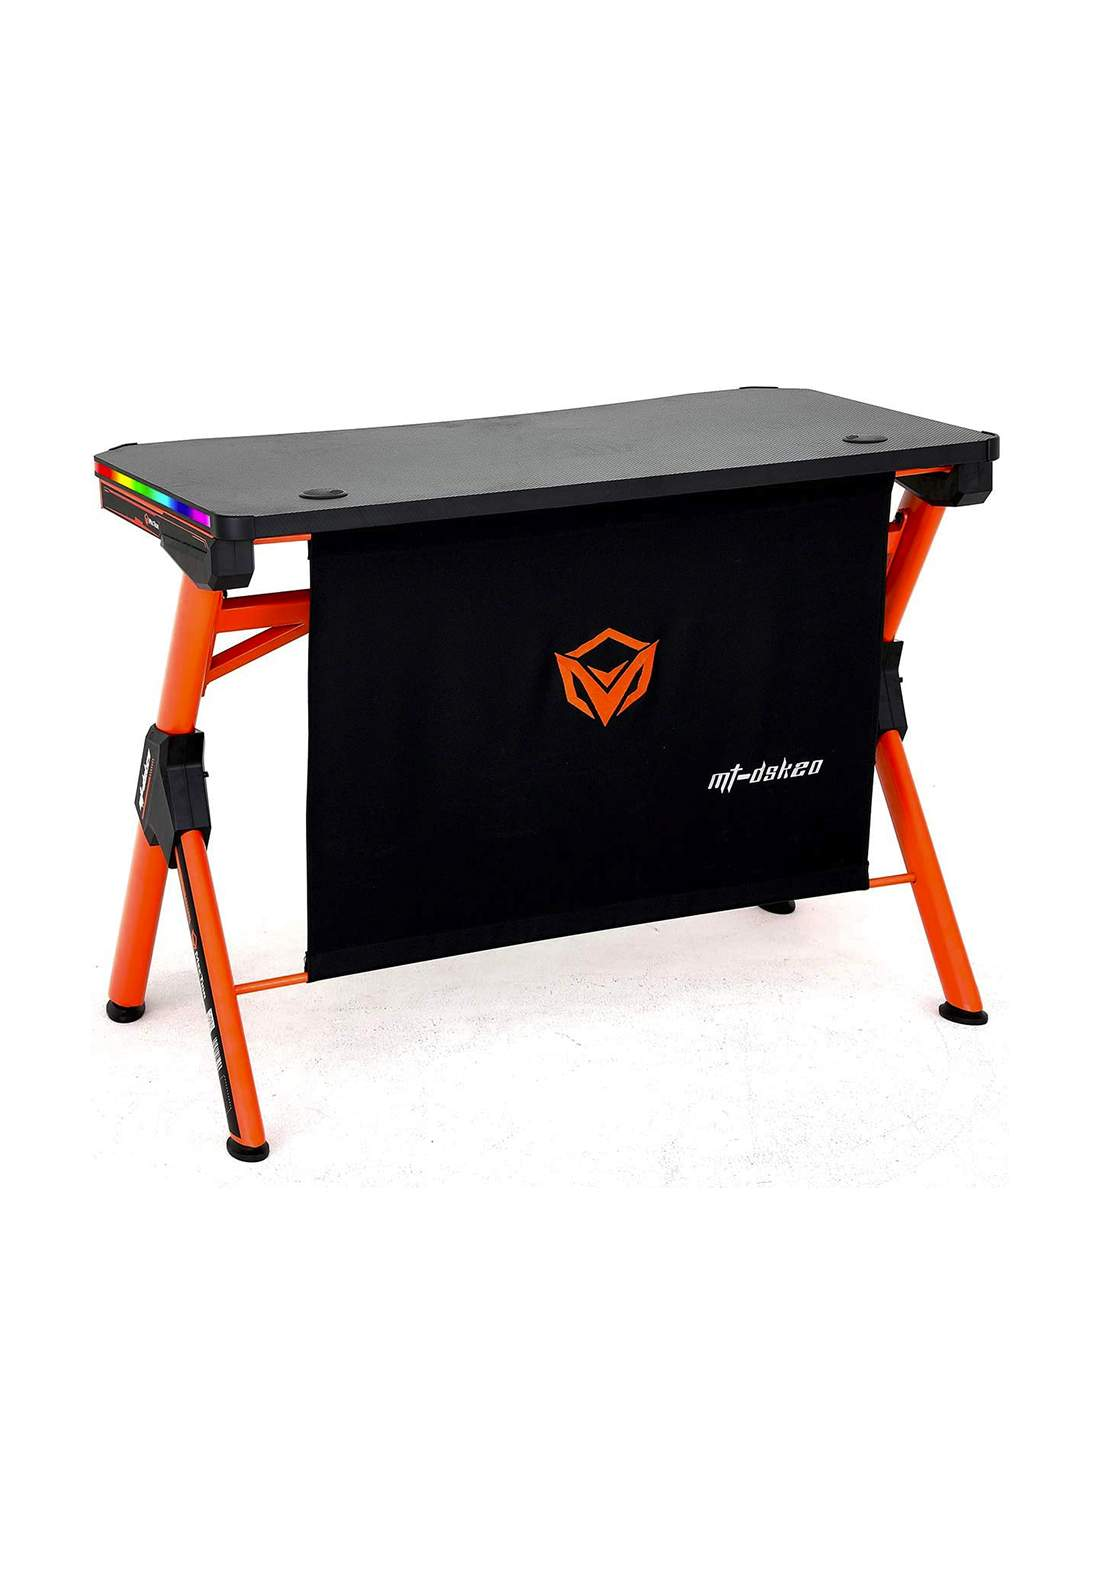 Meetion DSK20 RGB Led Light PC Computer Gaming E-Sport Desk - Black and Orange  طاولة حاسبة